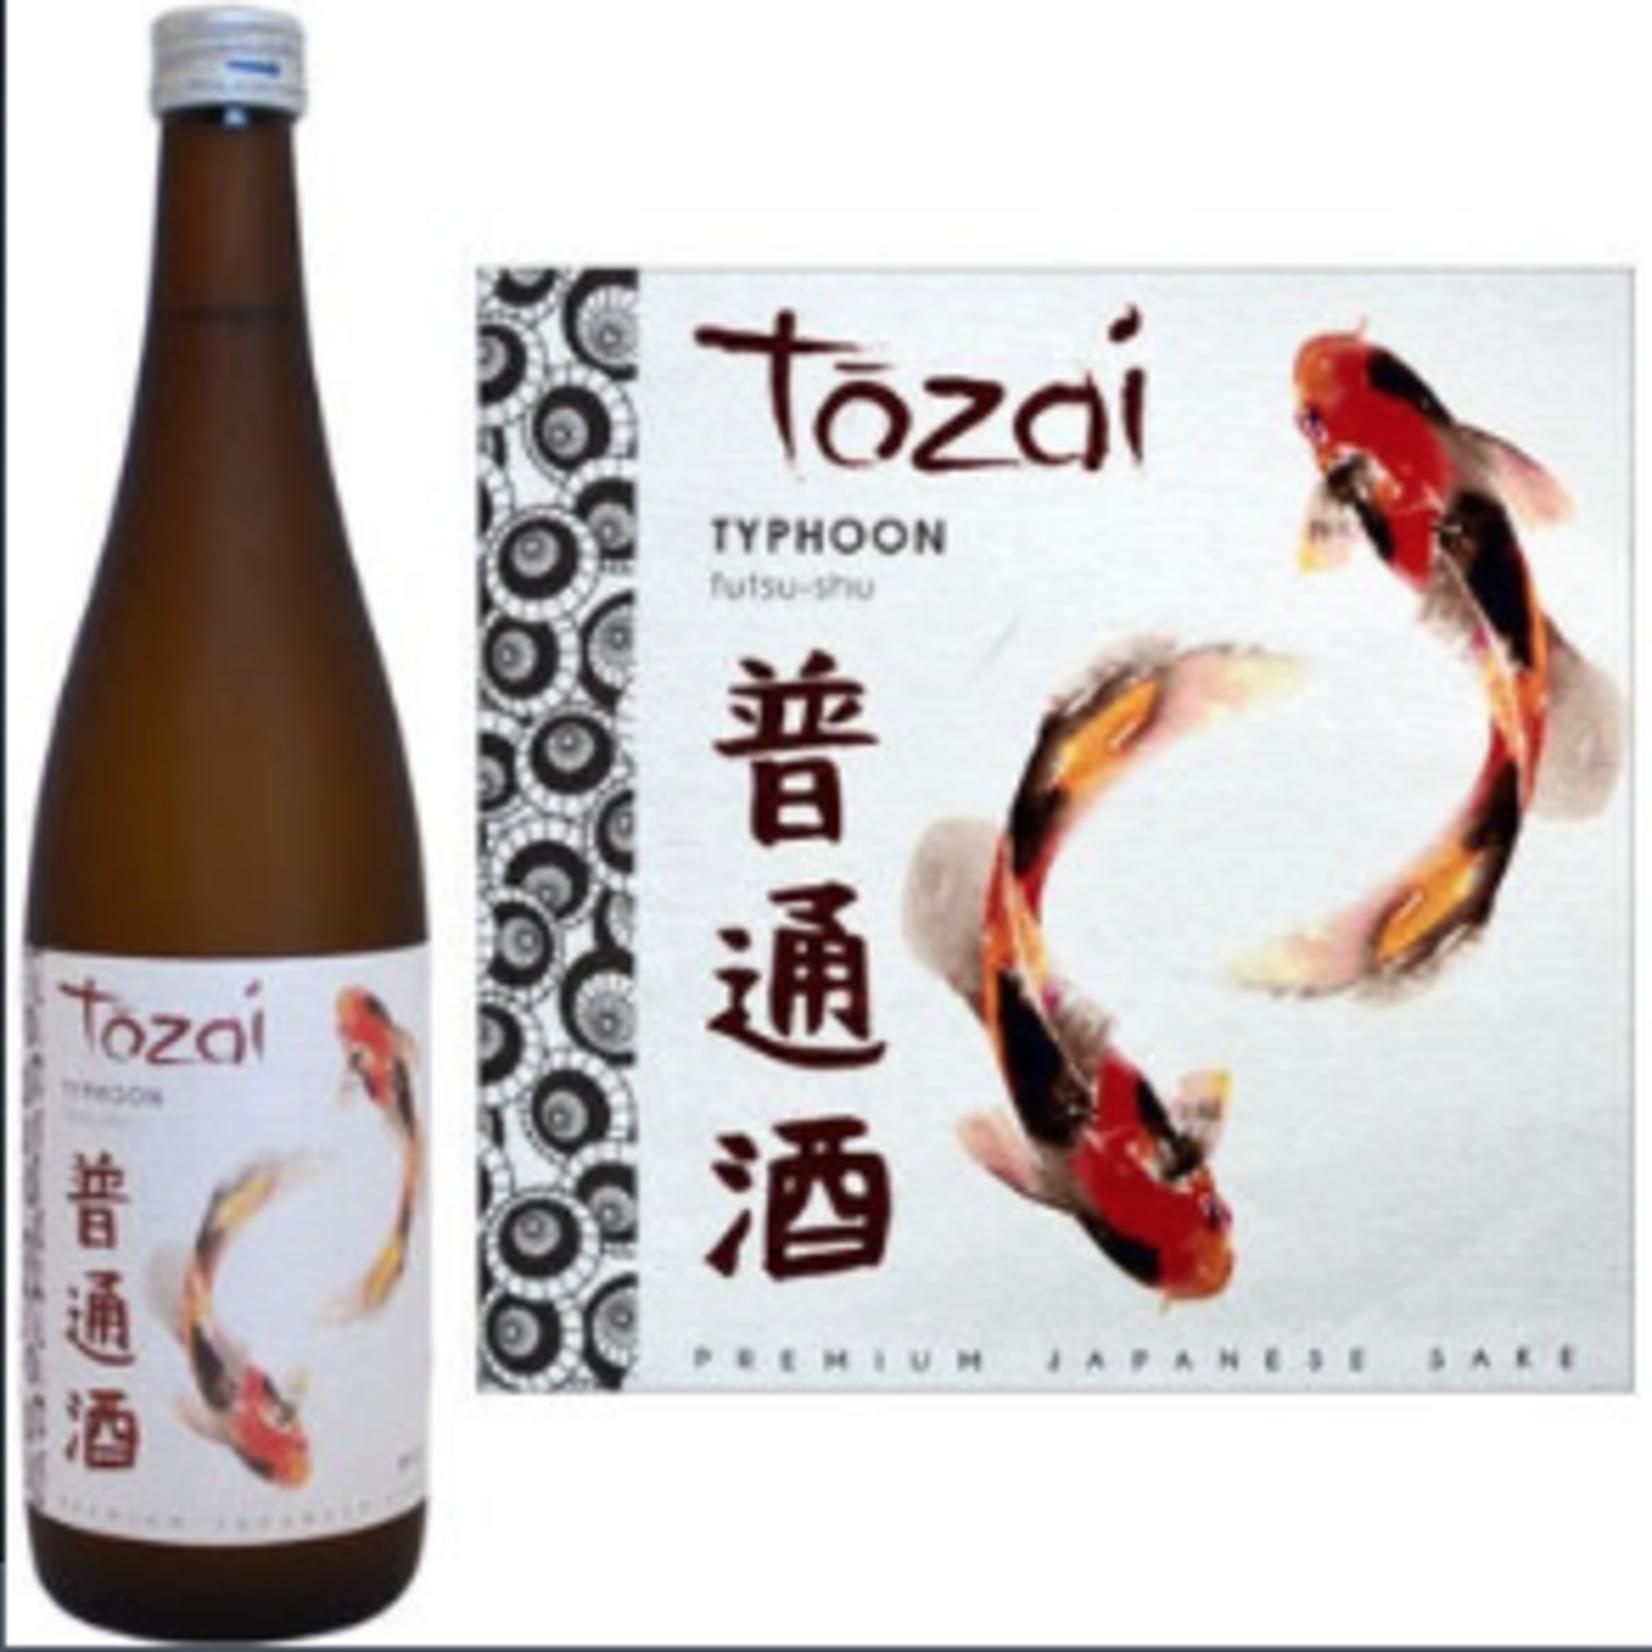 Vine Connections Tozai Typhoon Sake Japan